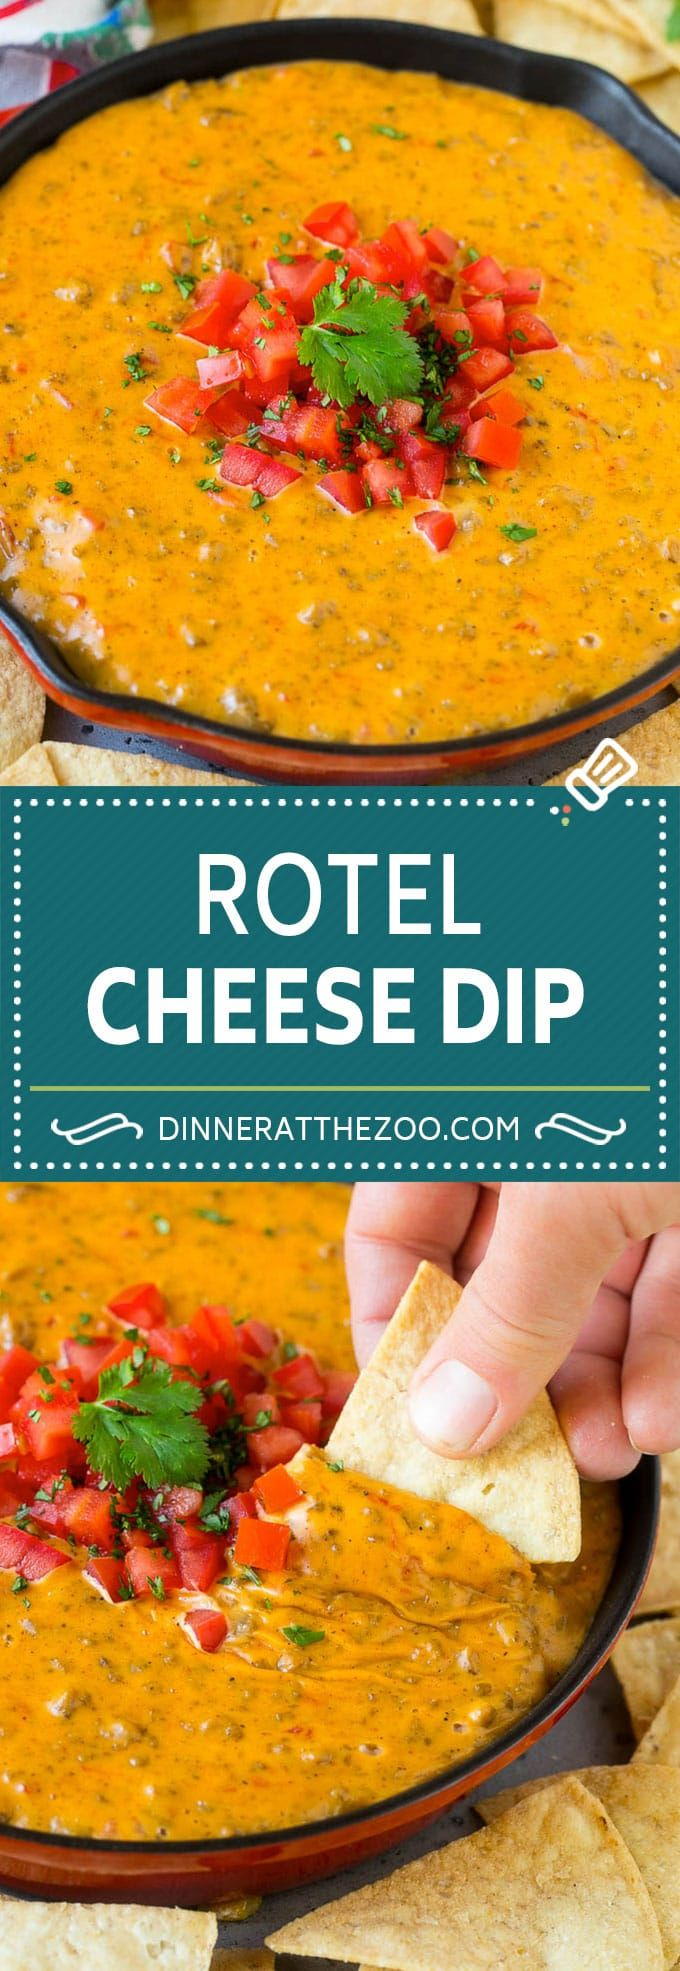 Rotel Dip Recipe | Mexican Cheese Dip | Beef and Cheese Dip | Velveeta Dip